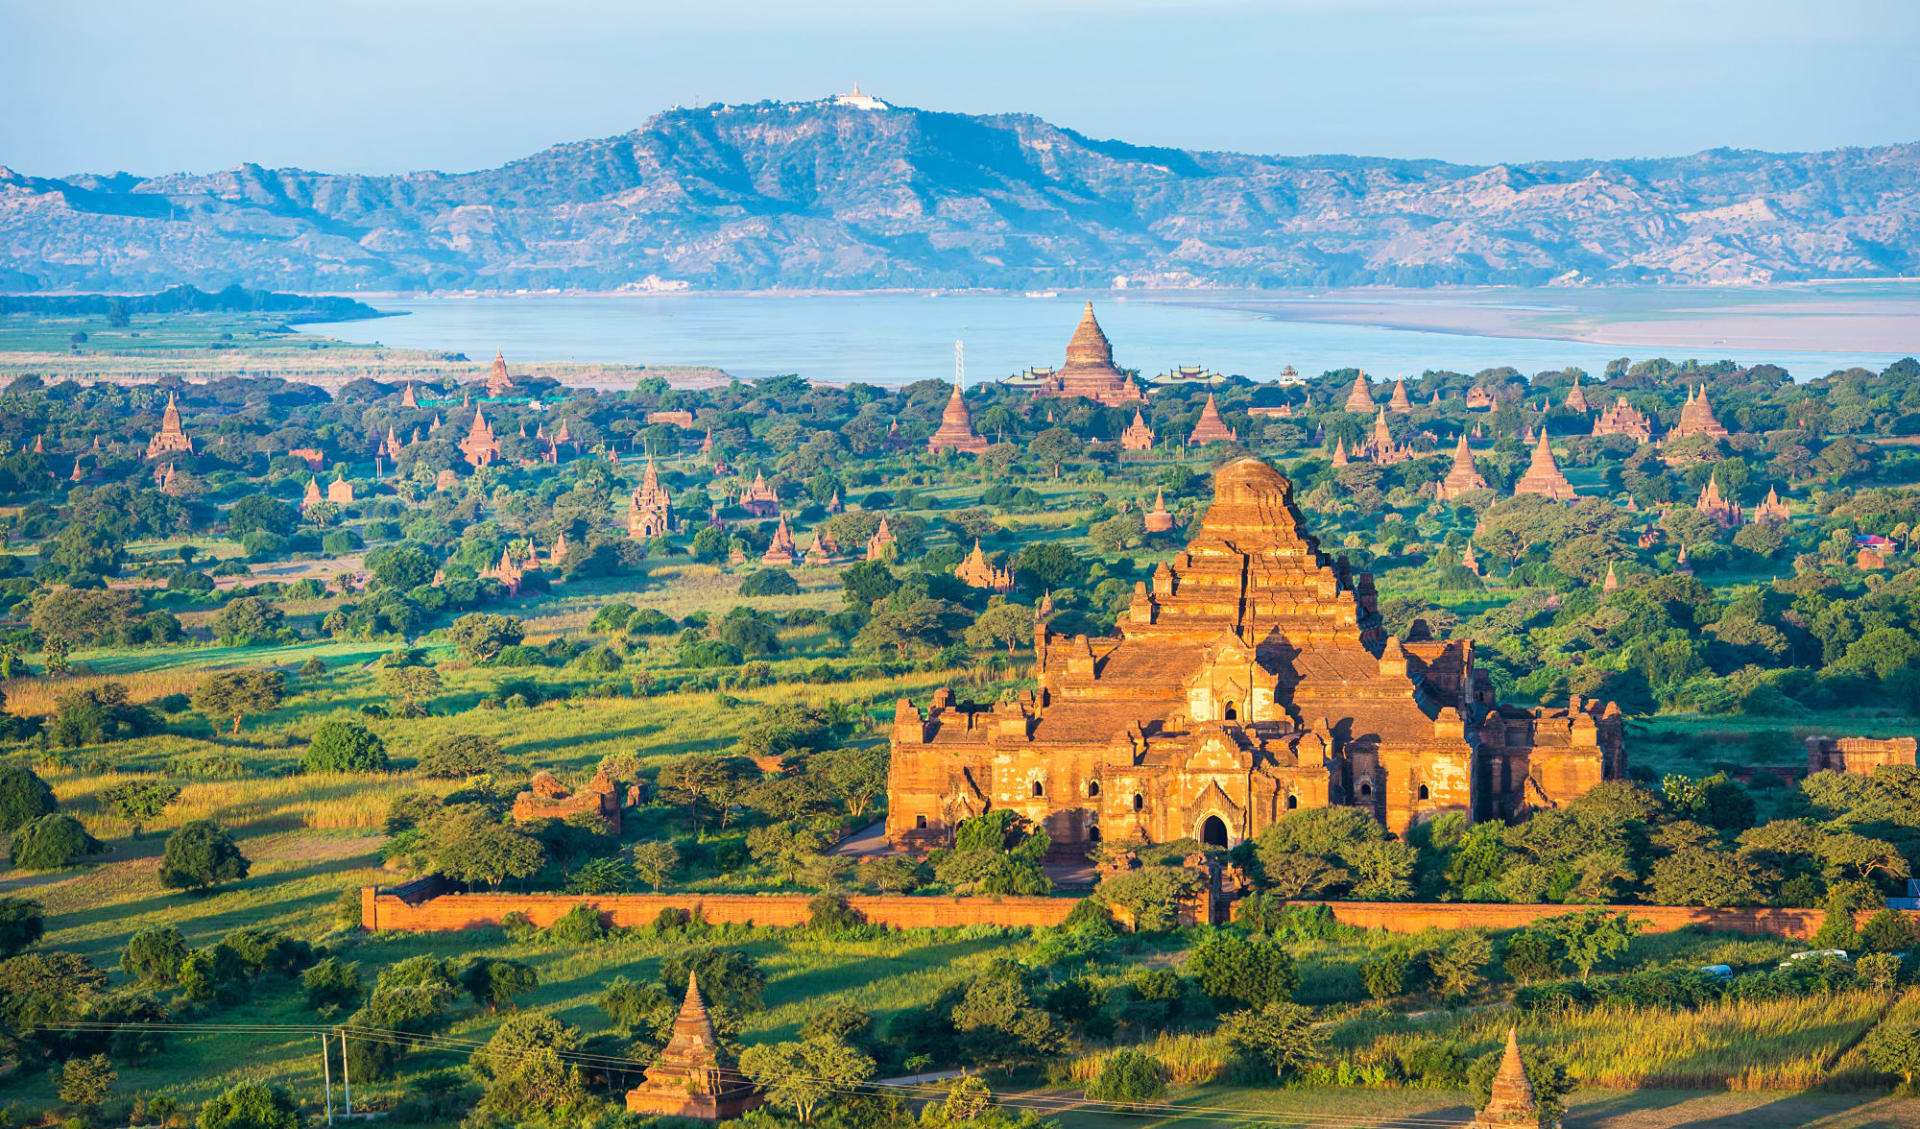 Flusskreuzfahrt auf der «Sanctuary Ananda» Mandalay-Bagan: Bagan - Ancient pagodas with altitude balloon